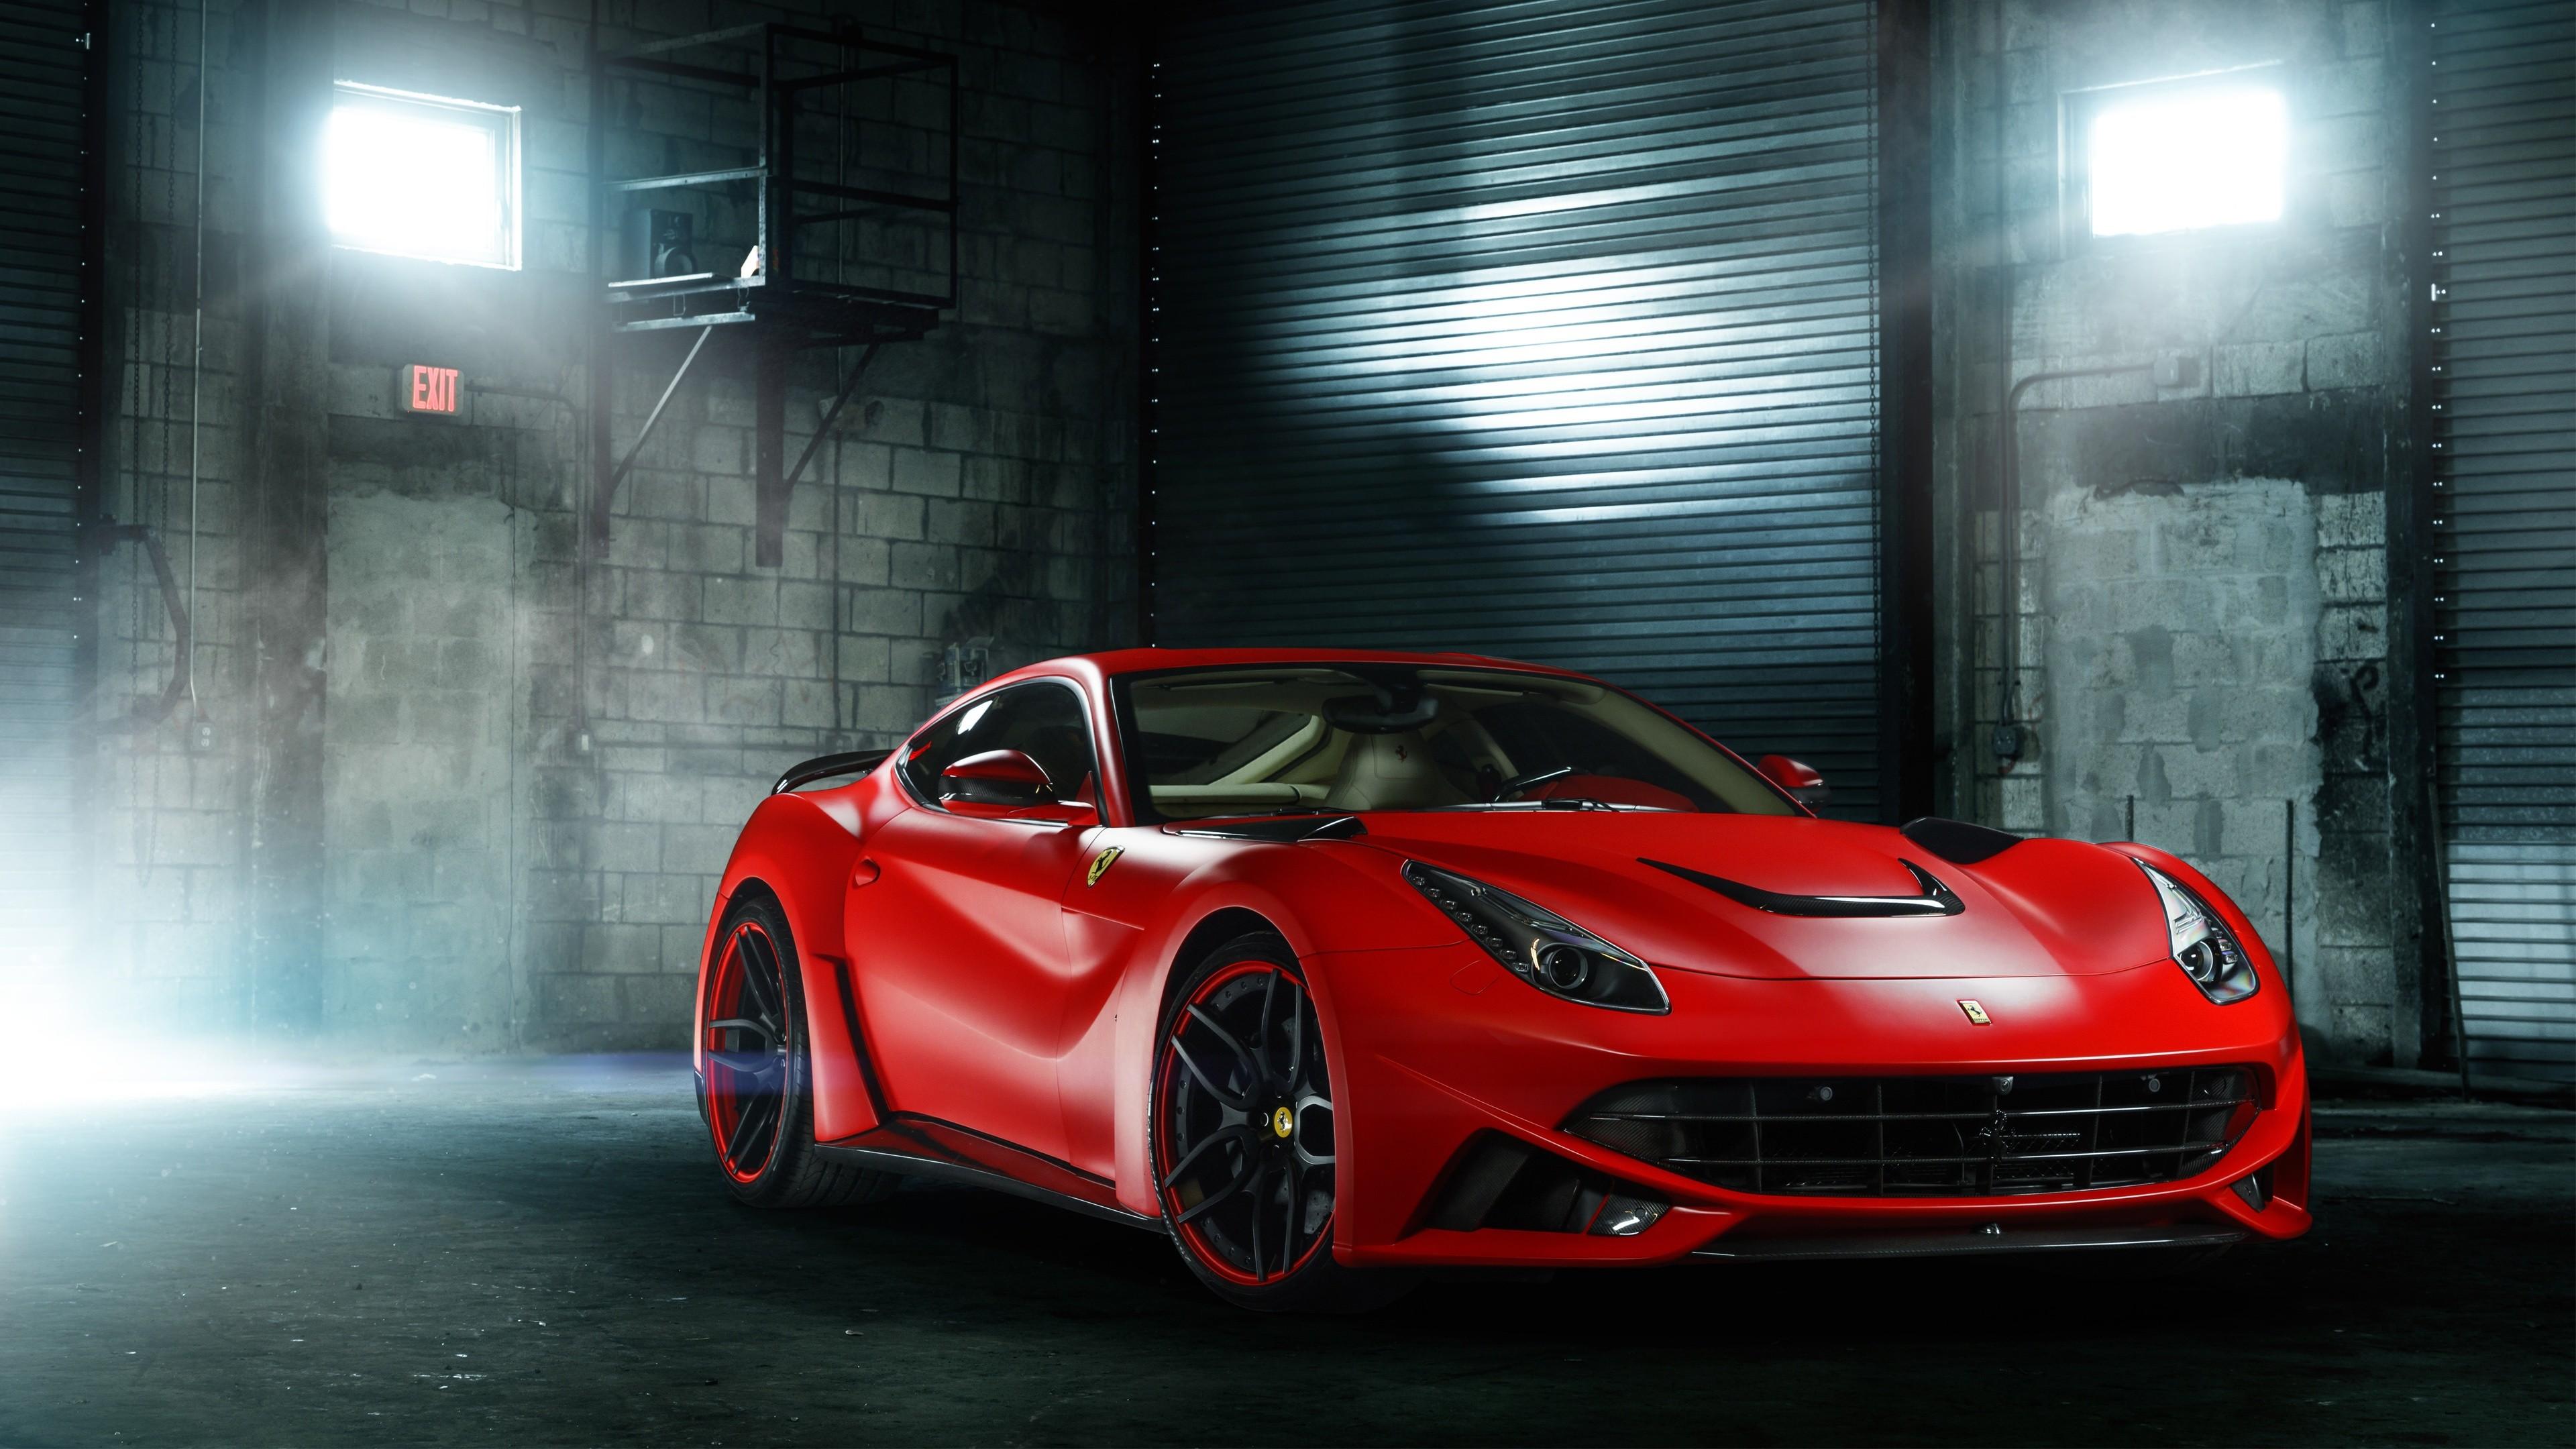 Ferrari F12 дорога забор  № 2437957  скачать